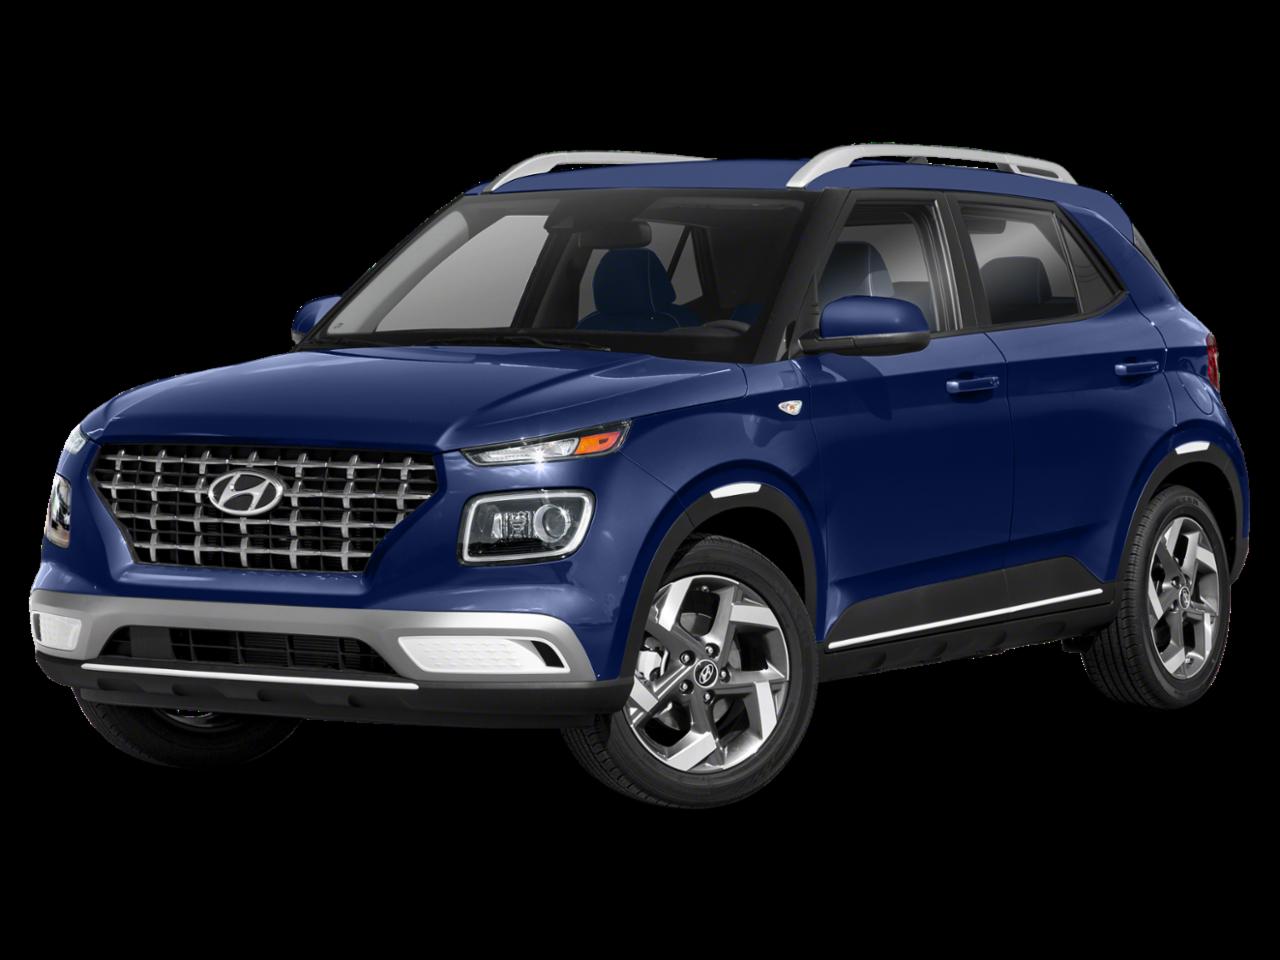 Hyundai 2022 Venue Limited